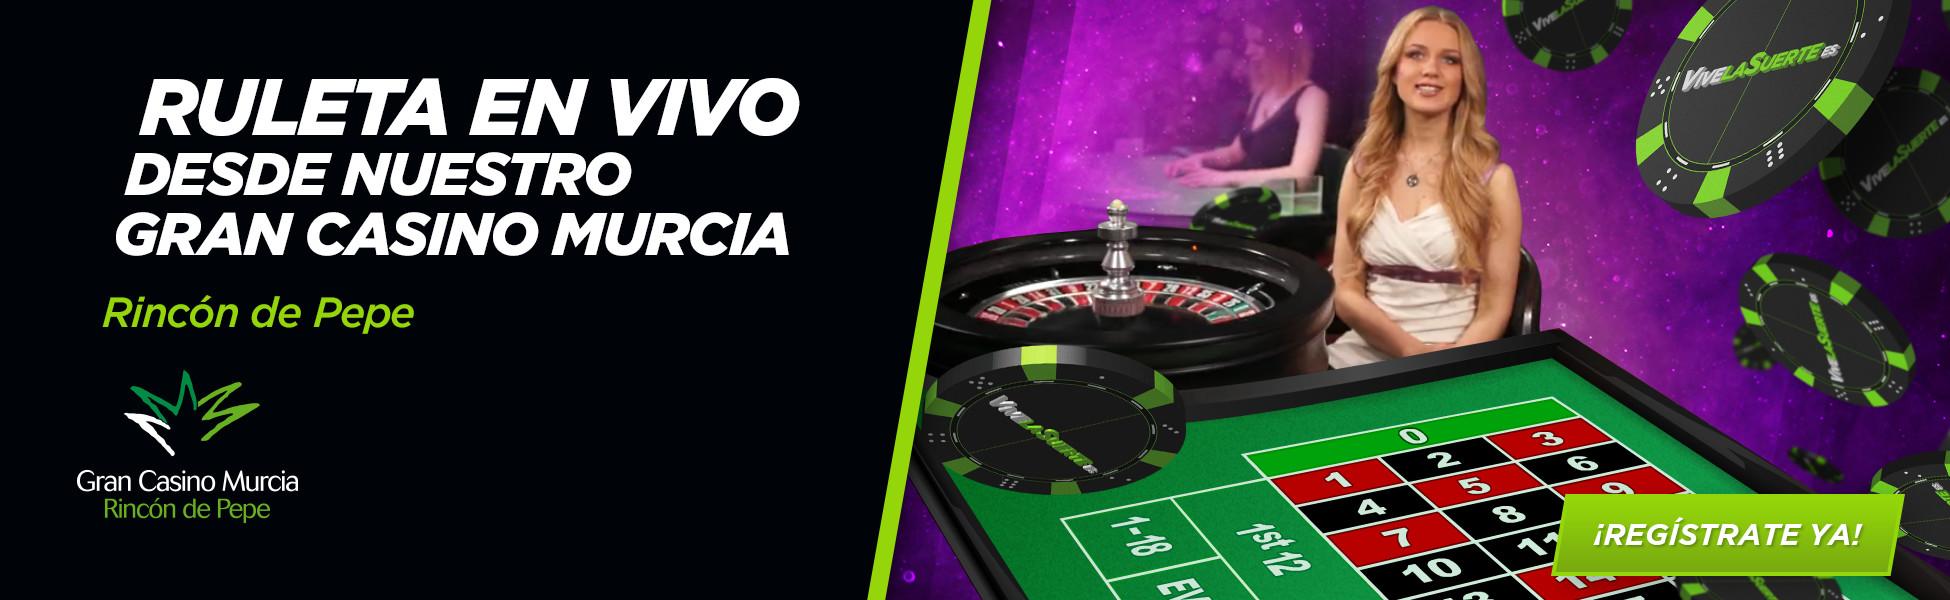 Bono casino reciba email ruleta de decisiones-130142